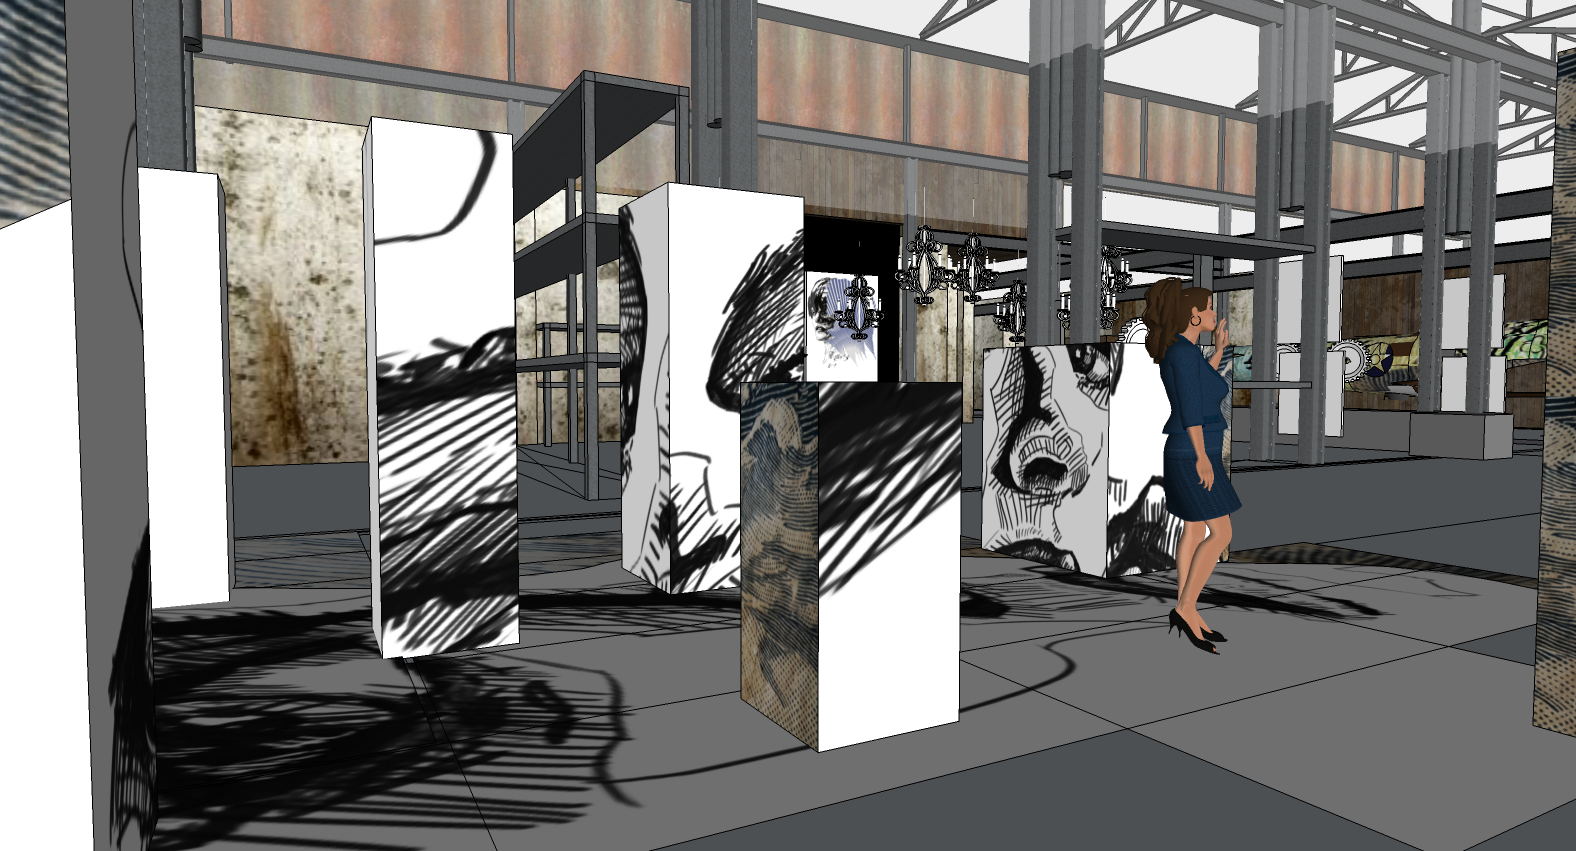 dadageek_Riley-Triggs_3D-Modeling-for-Art-Proposals_03.jpg